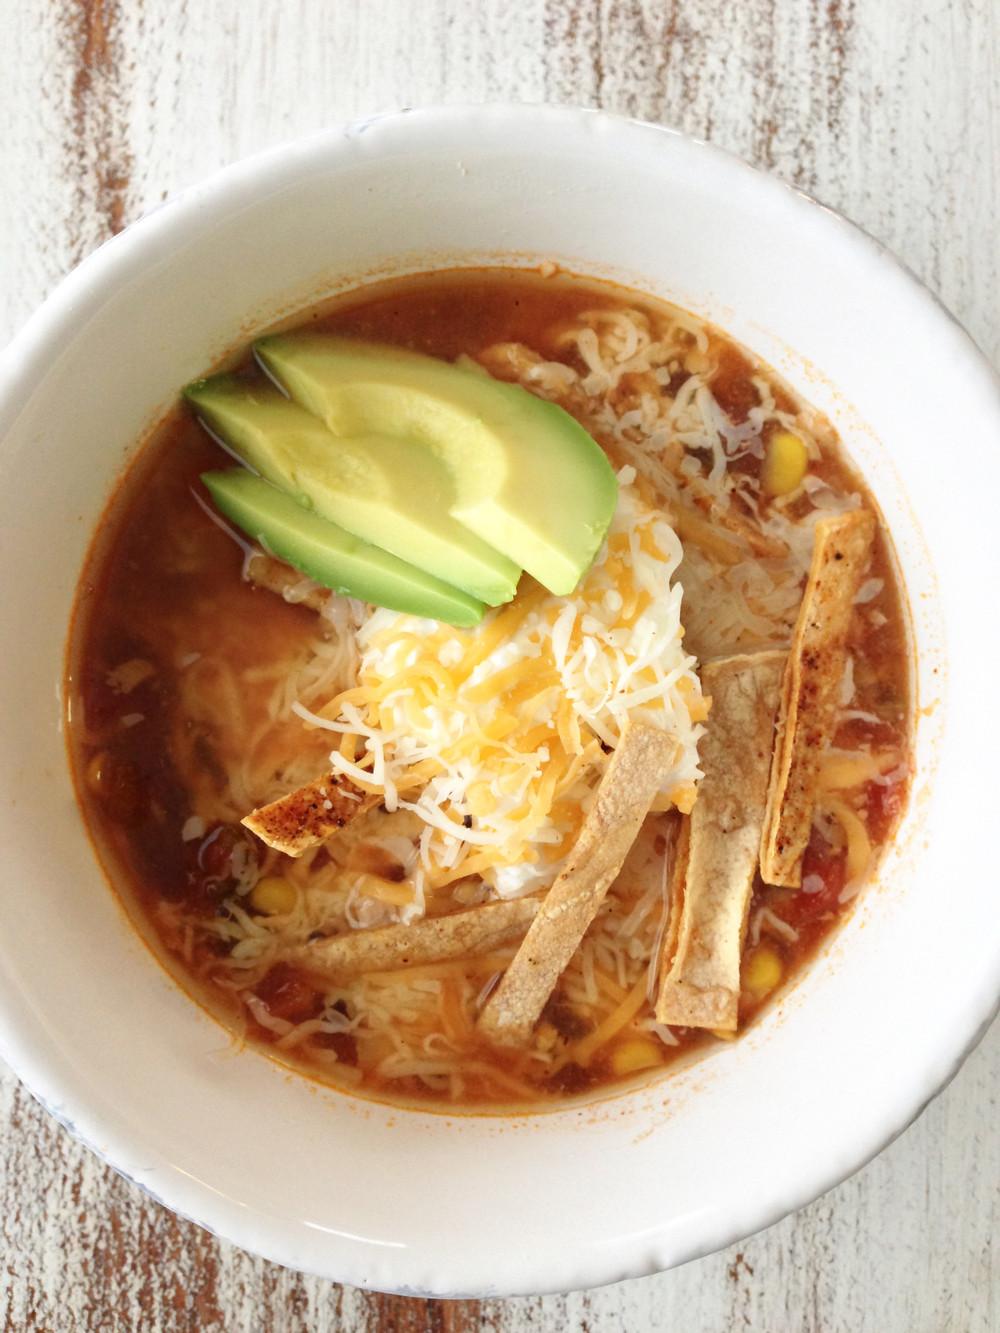 Chicken Tortilla Soup Crock Pot Healthy  Healthified Crock Pot Chicken Tortilla Soup — The Skinny Fork